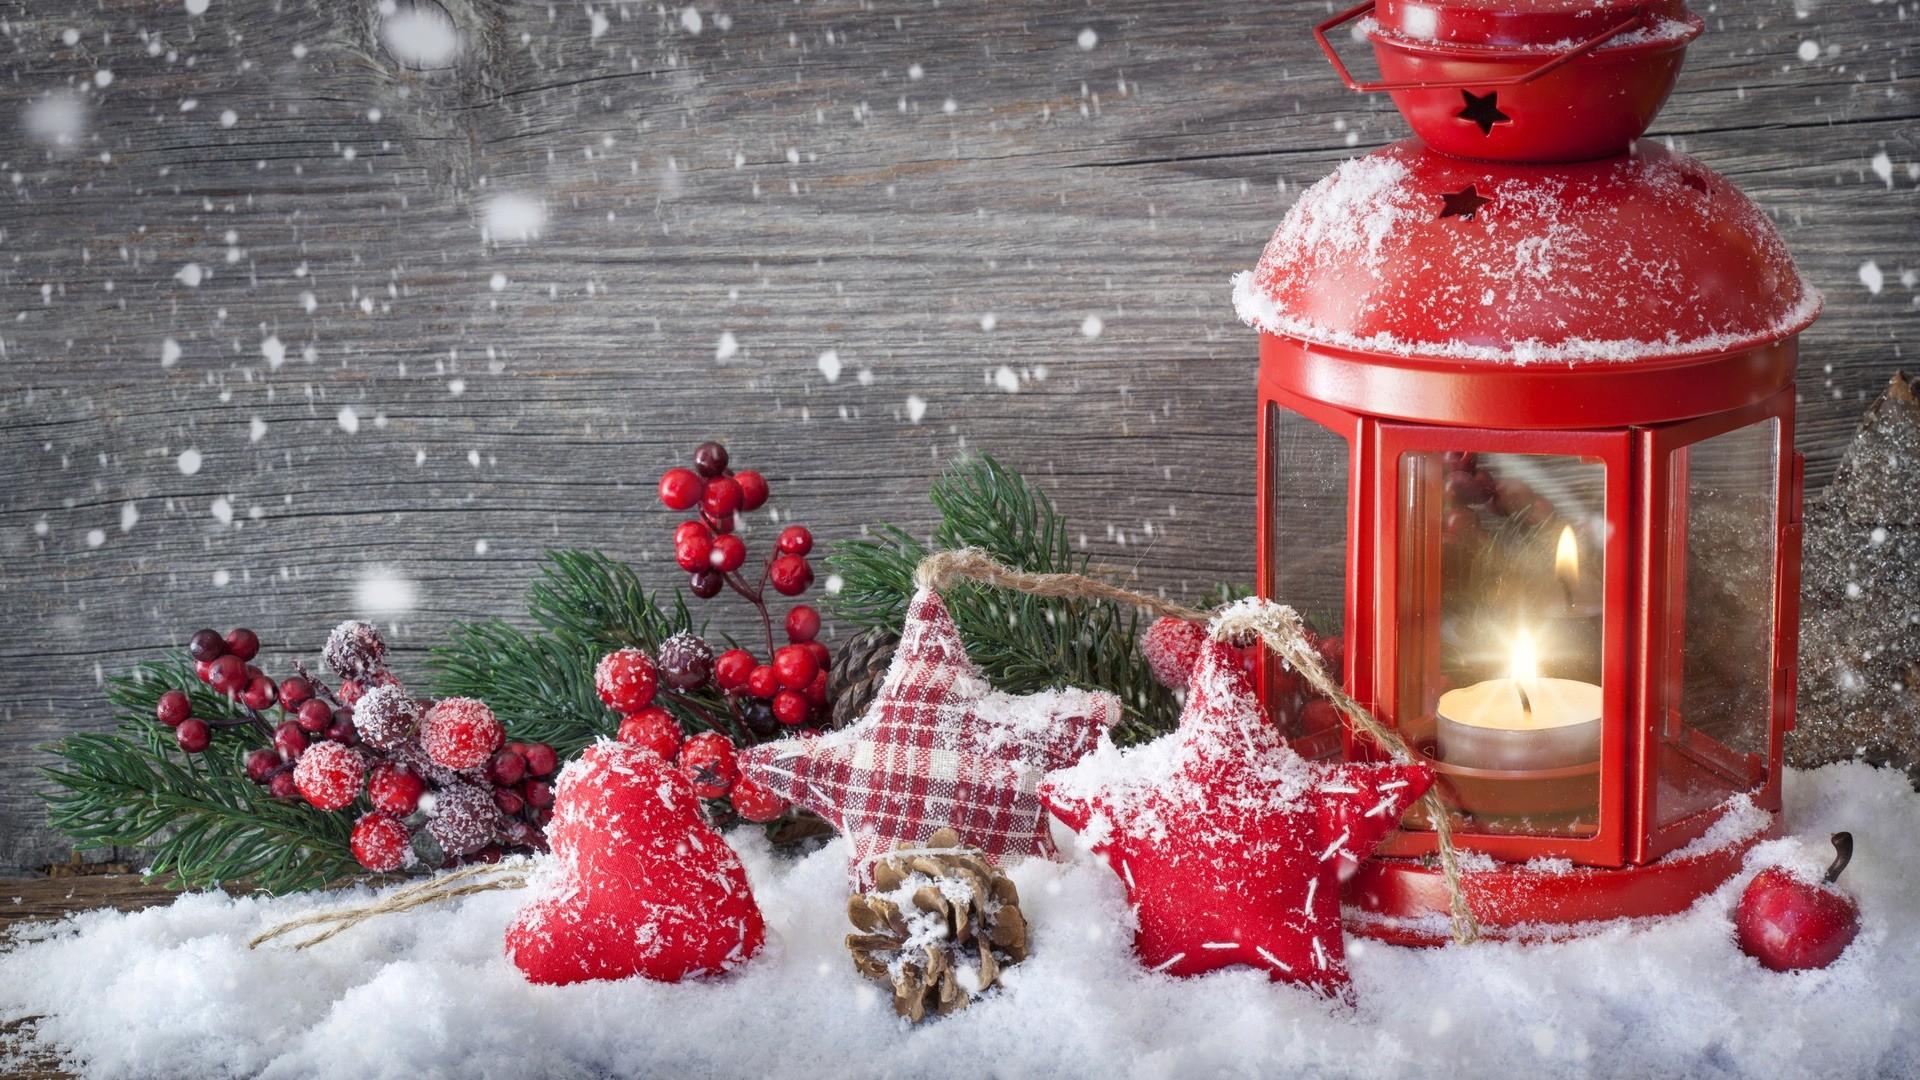 Christmas Snow Wallpapers For Desktop Wallpaper 1920 x 1080 px 623.08 KB  pink lights blue